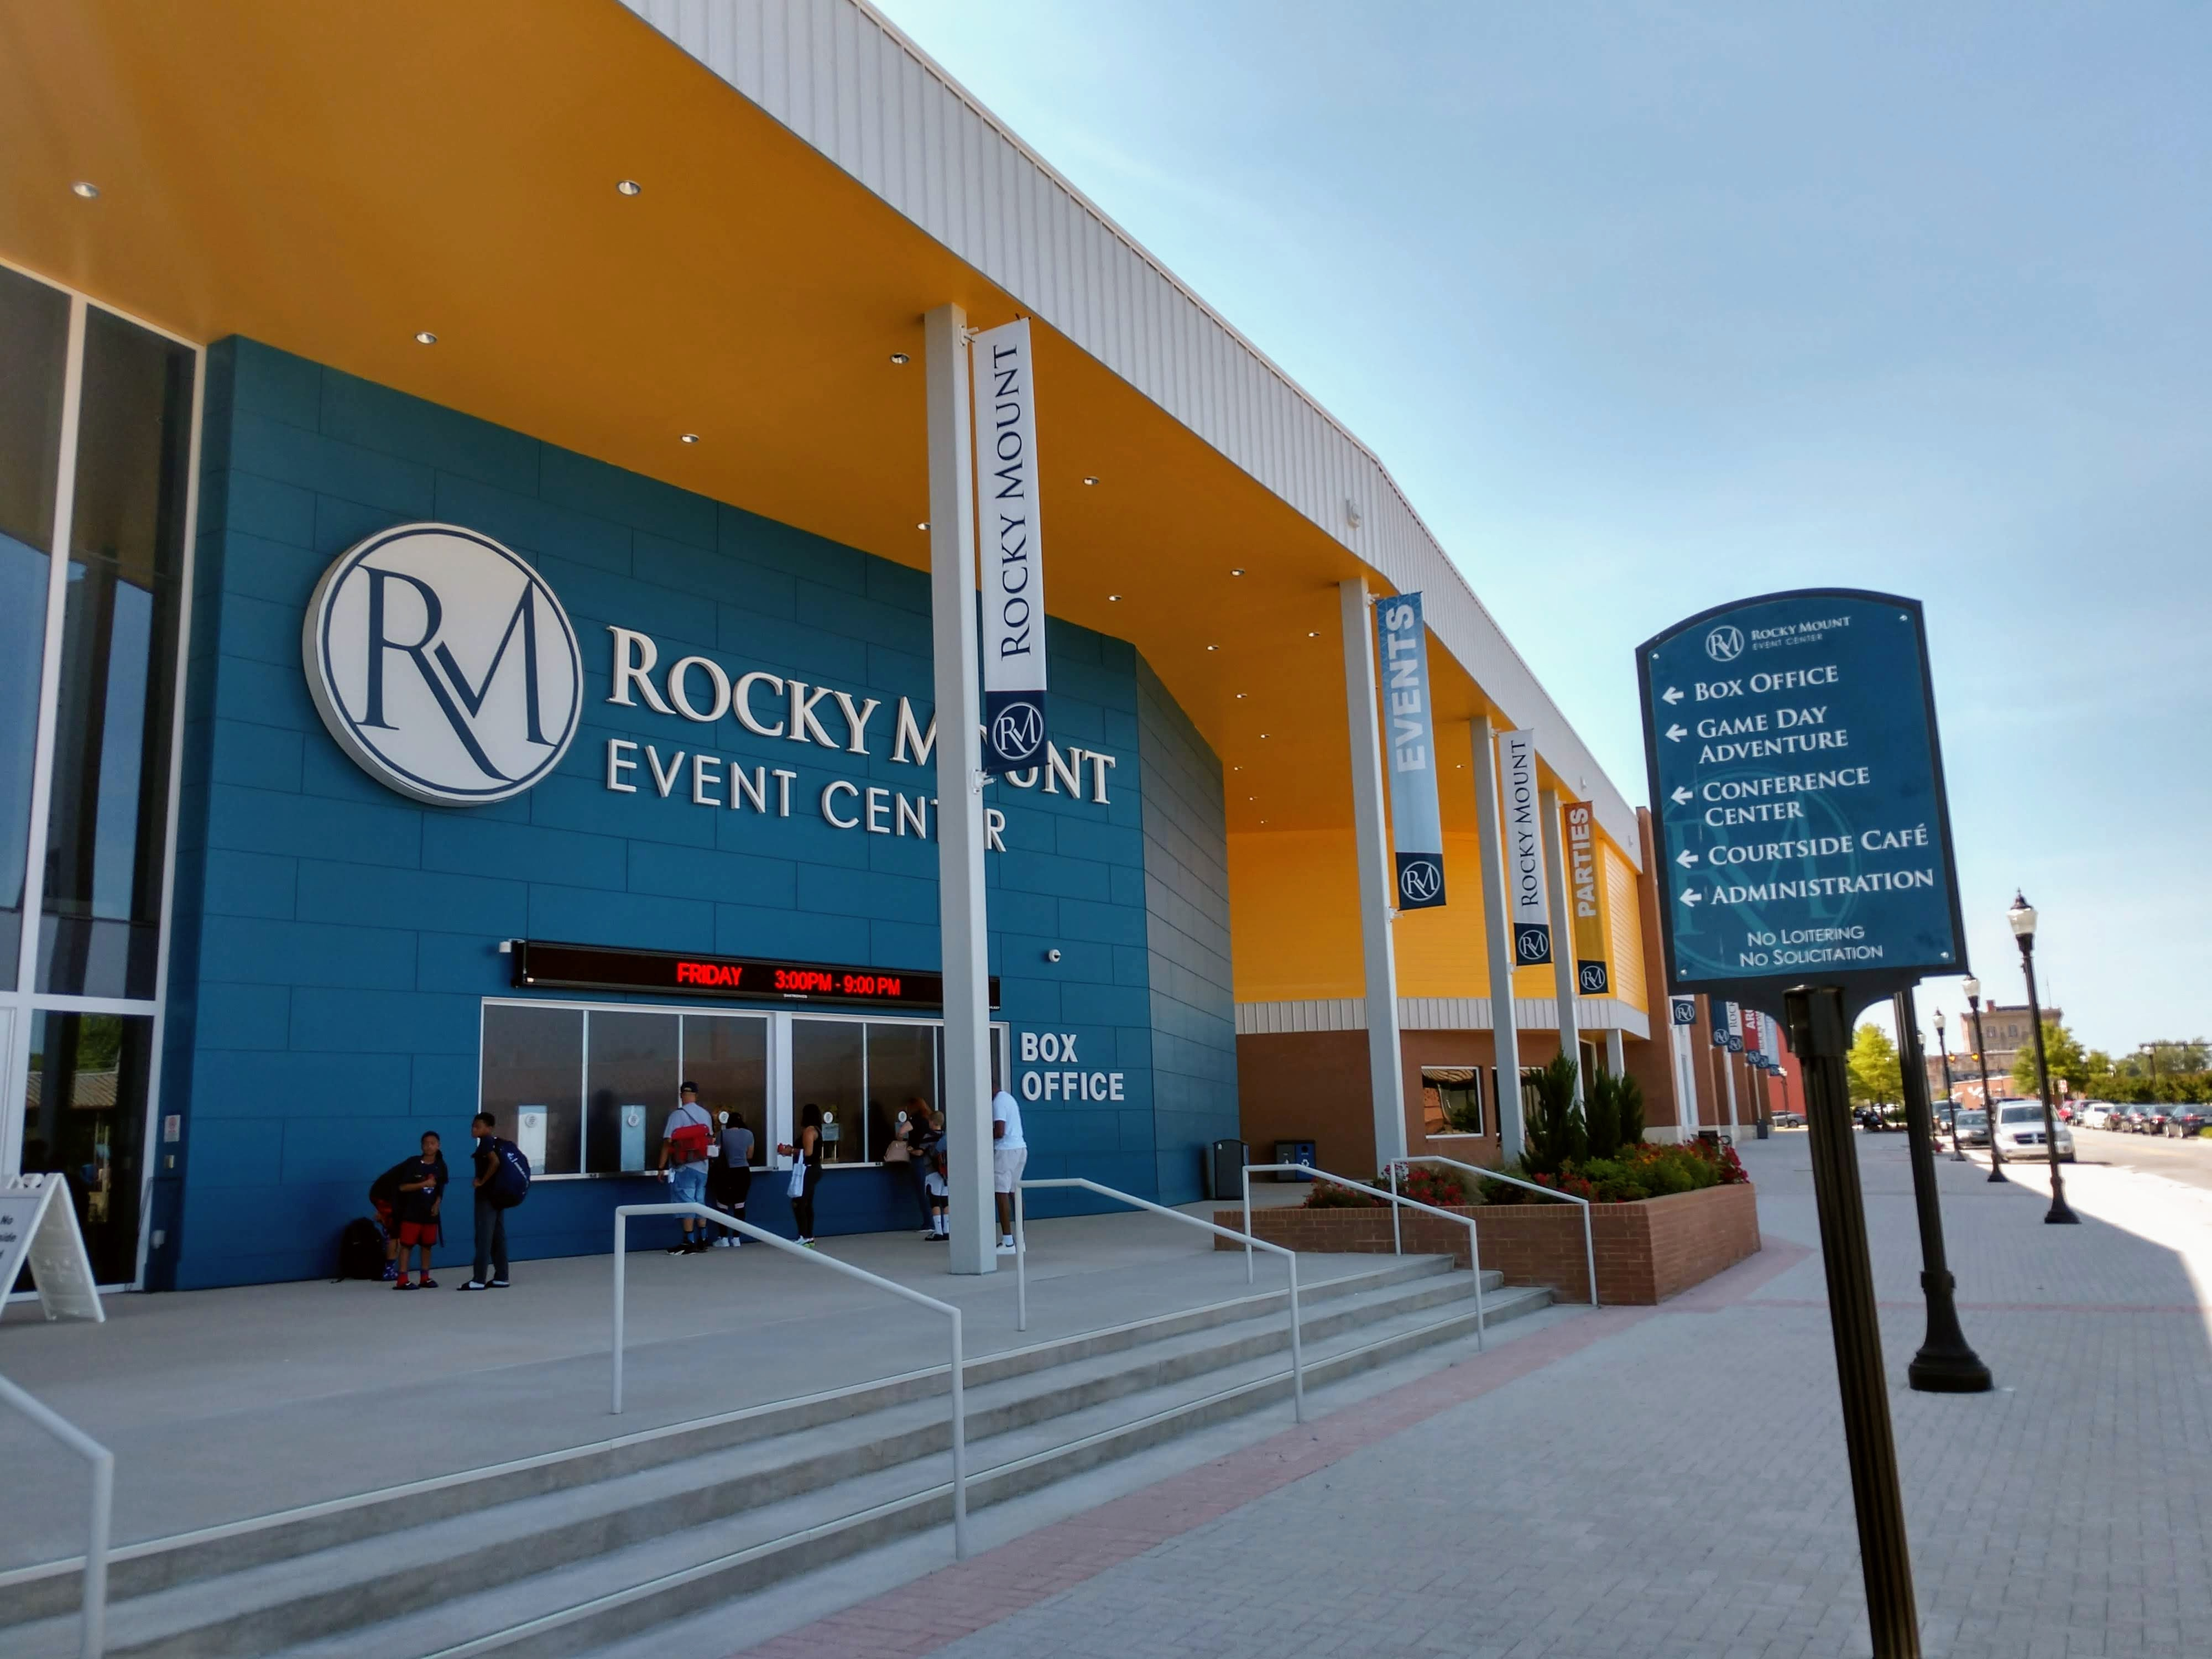 Rocky_Mount_Event_Center_Main_Entrance